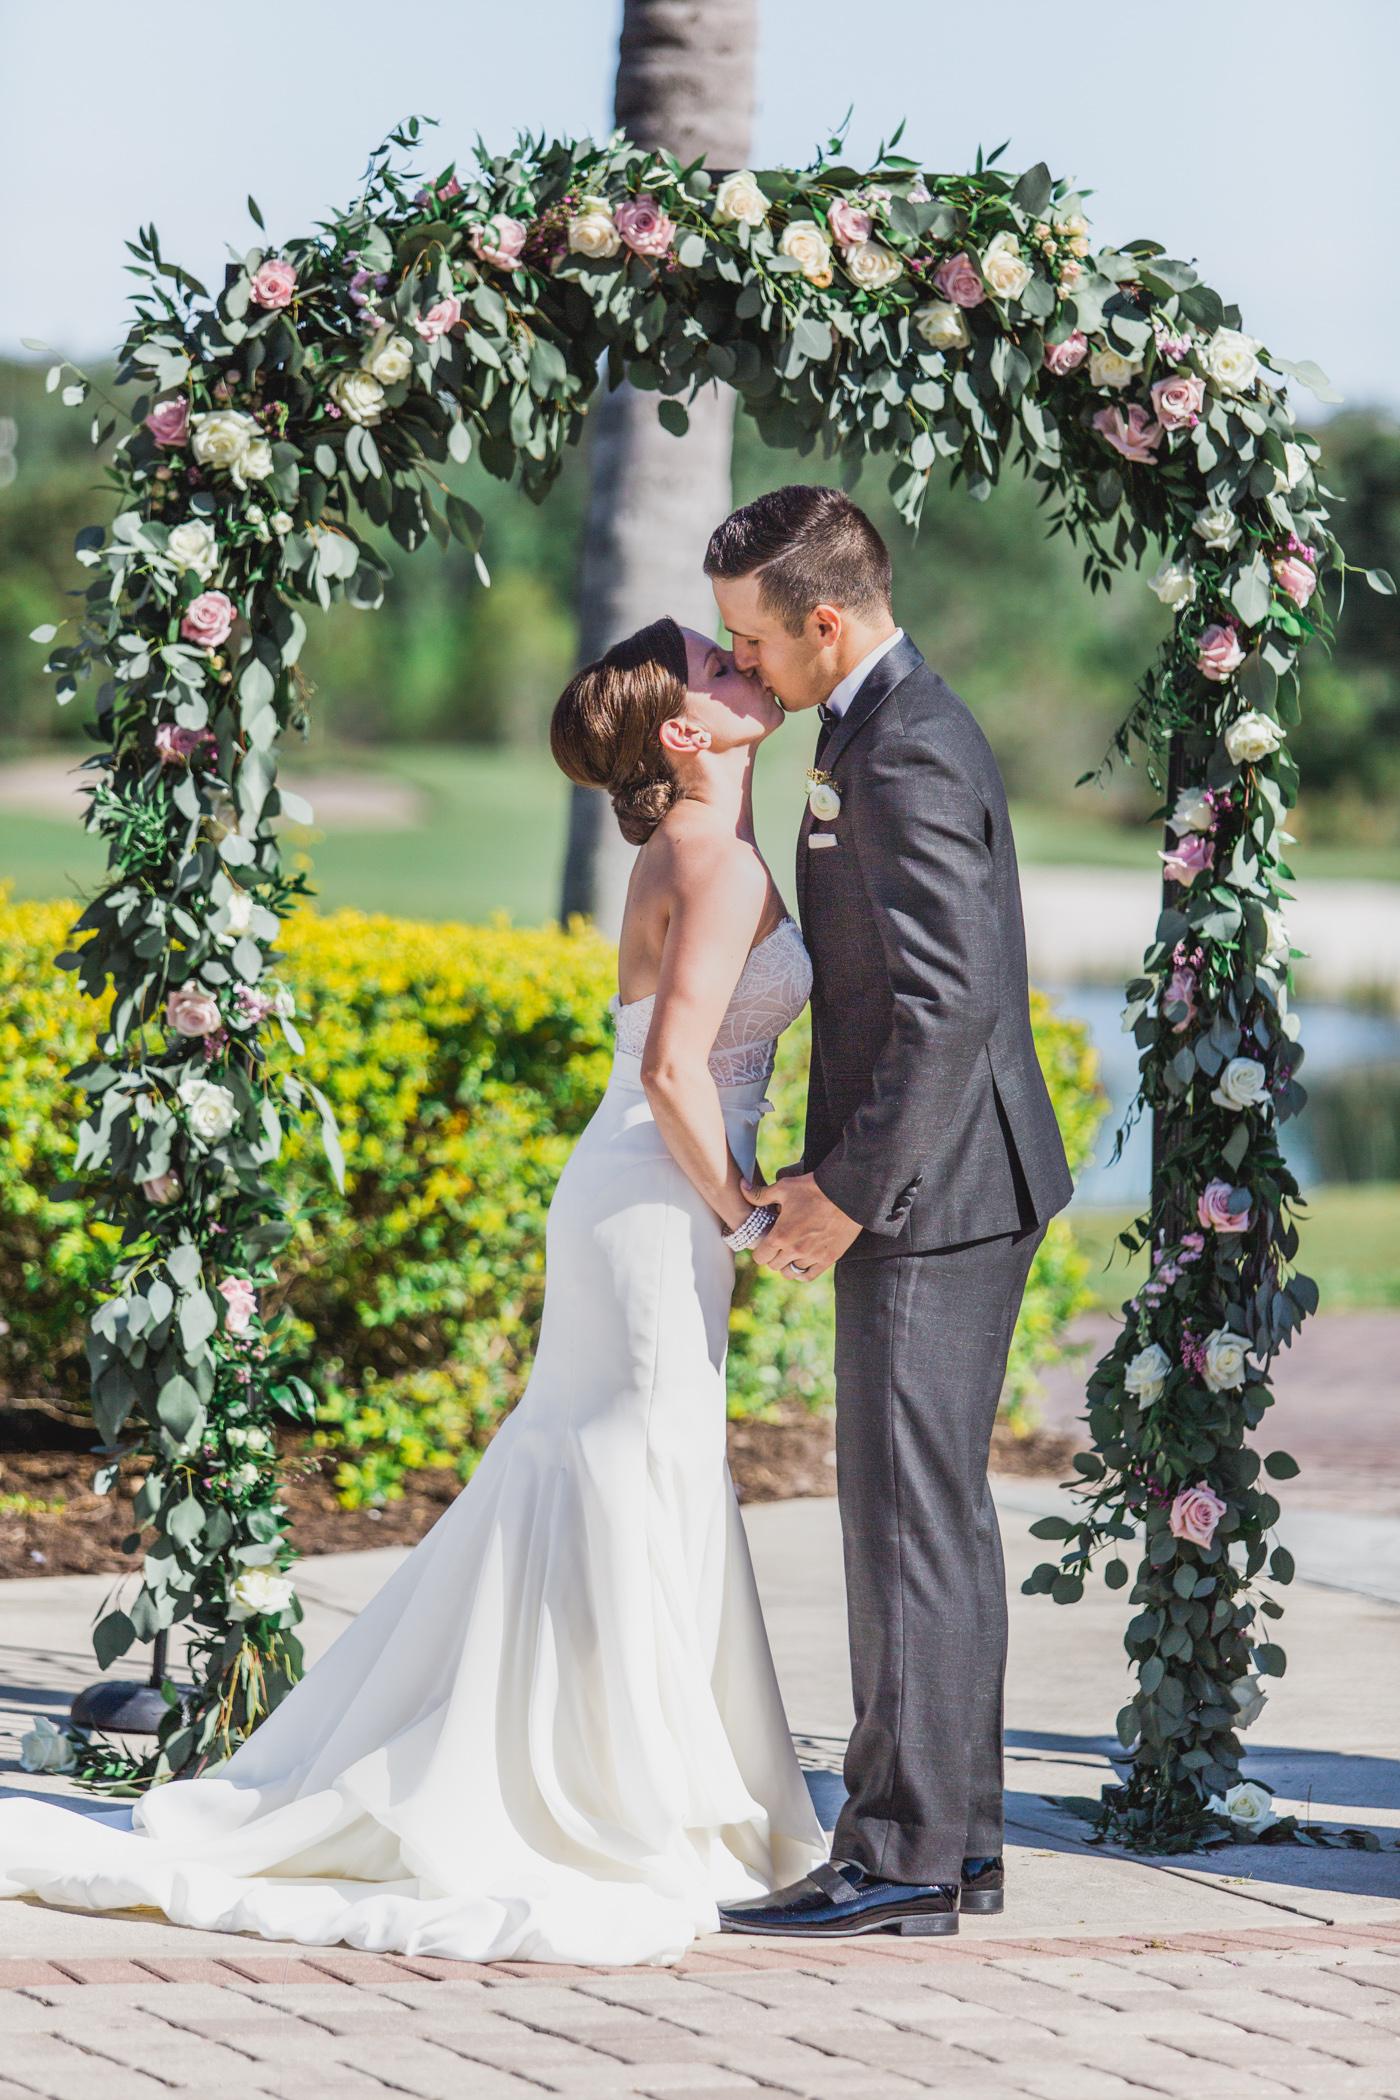 David & Allie - Shingle Creek Wedding Sneak Peek Spring 2016 - Web 12.jpg